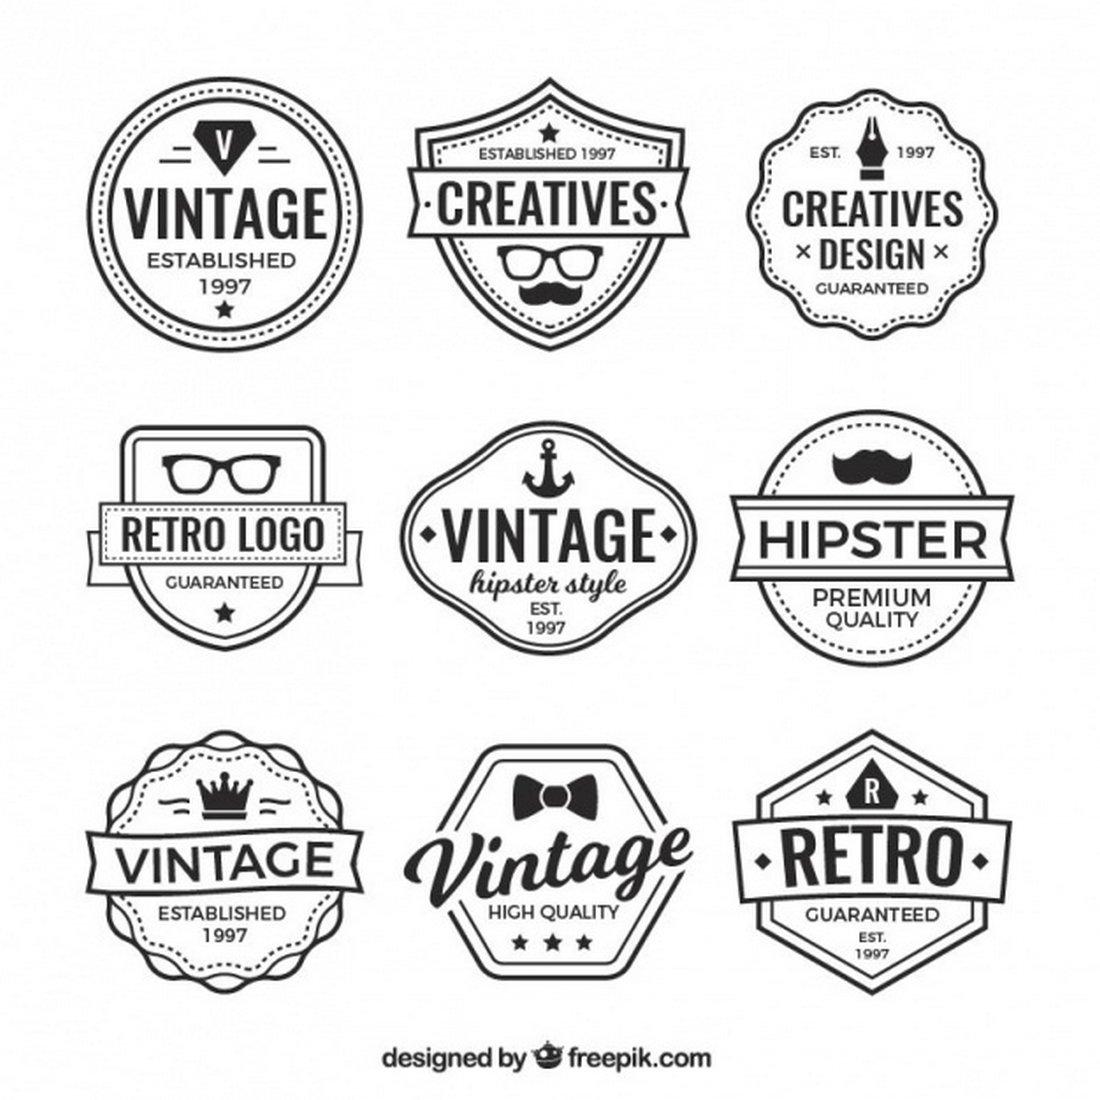 Free Vintage Hipster Logo Templates